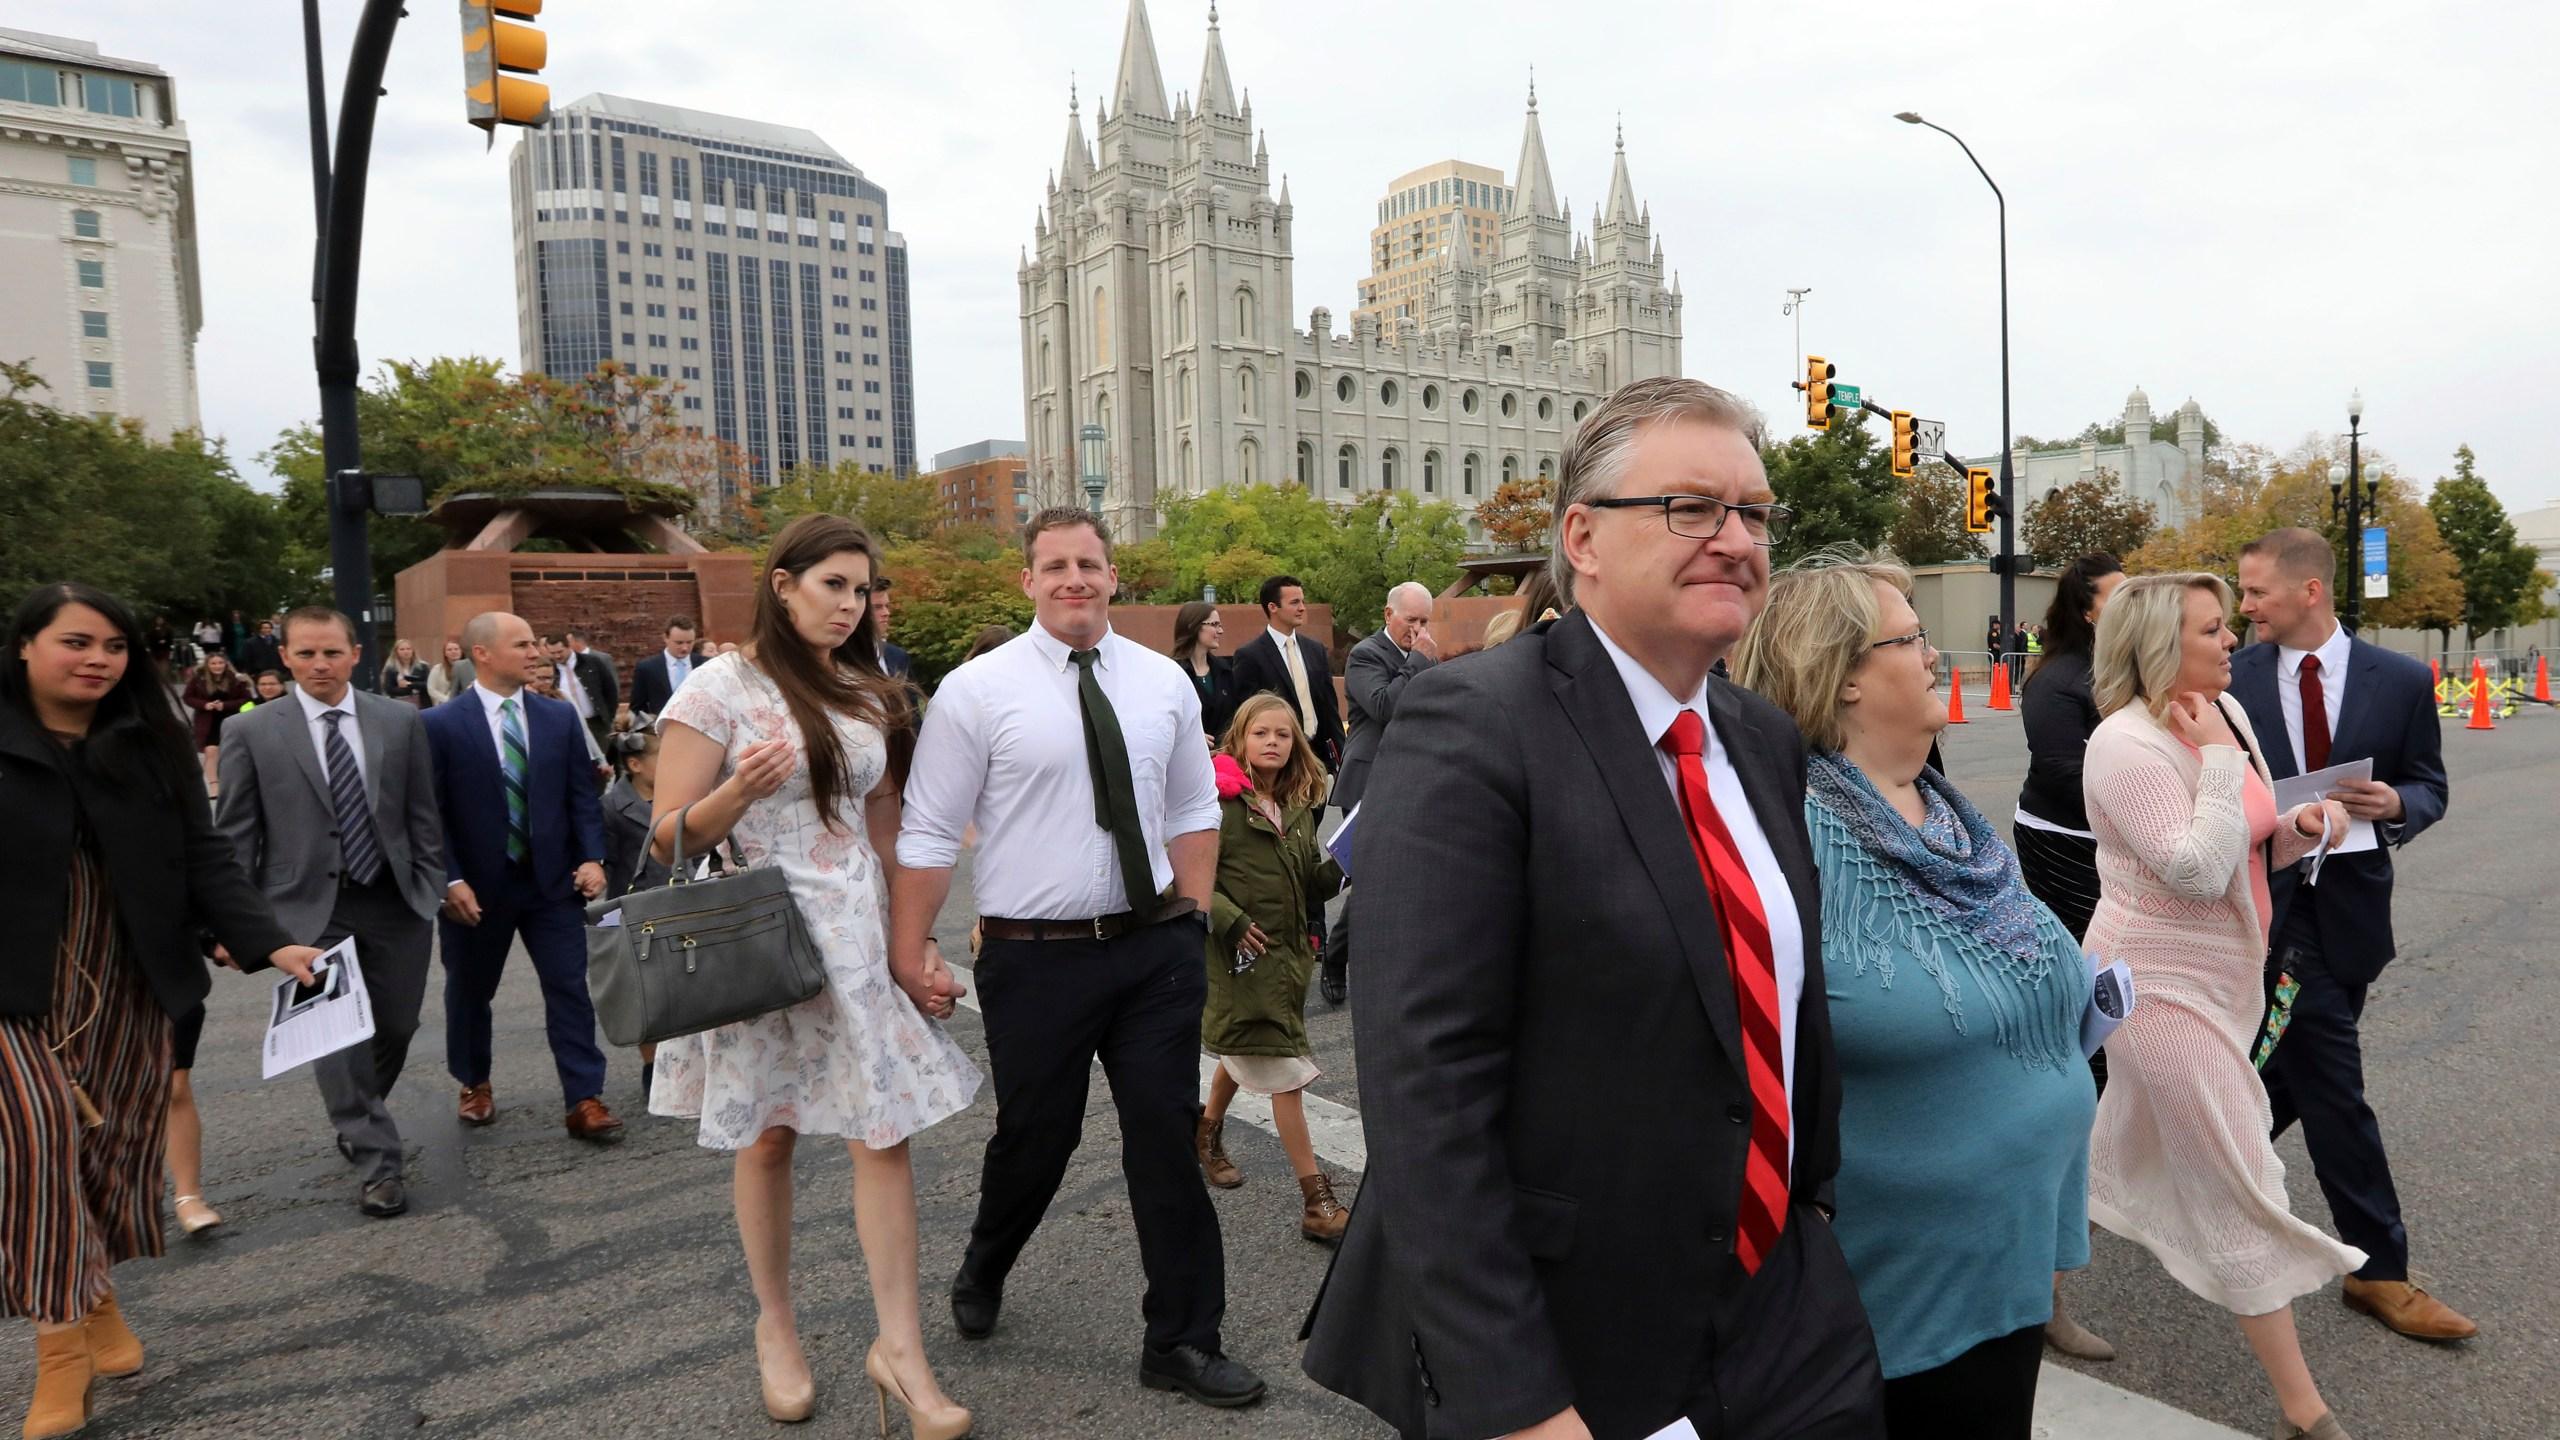 Mormon_Conference_47068-159532.jpg75826065